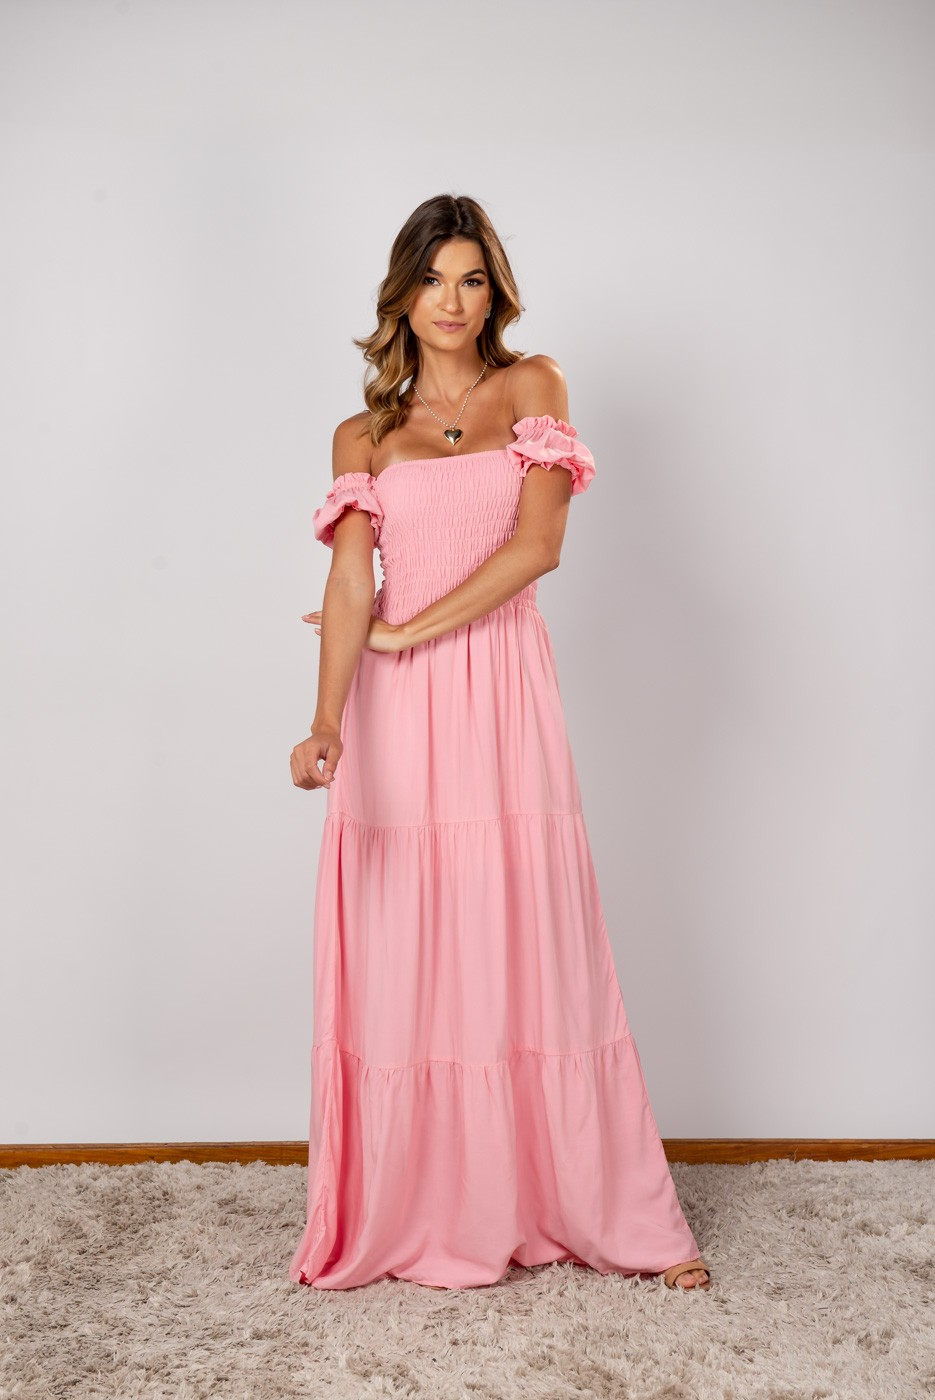 Vestido Lastex Ombro Rosa Claro